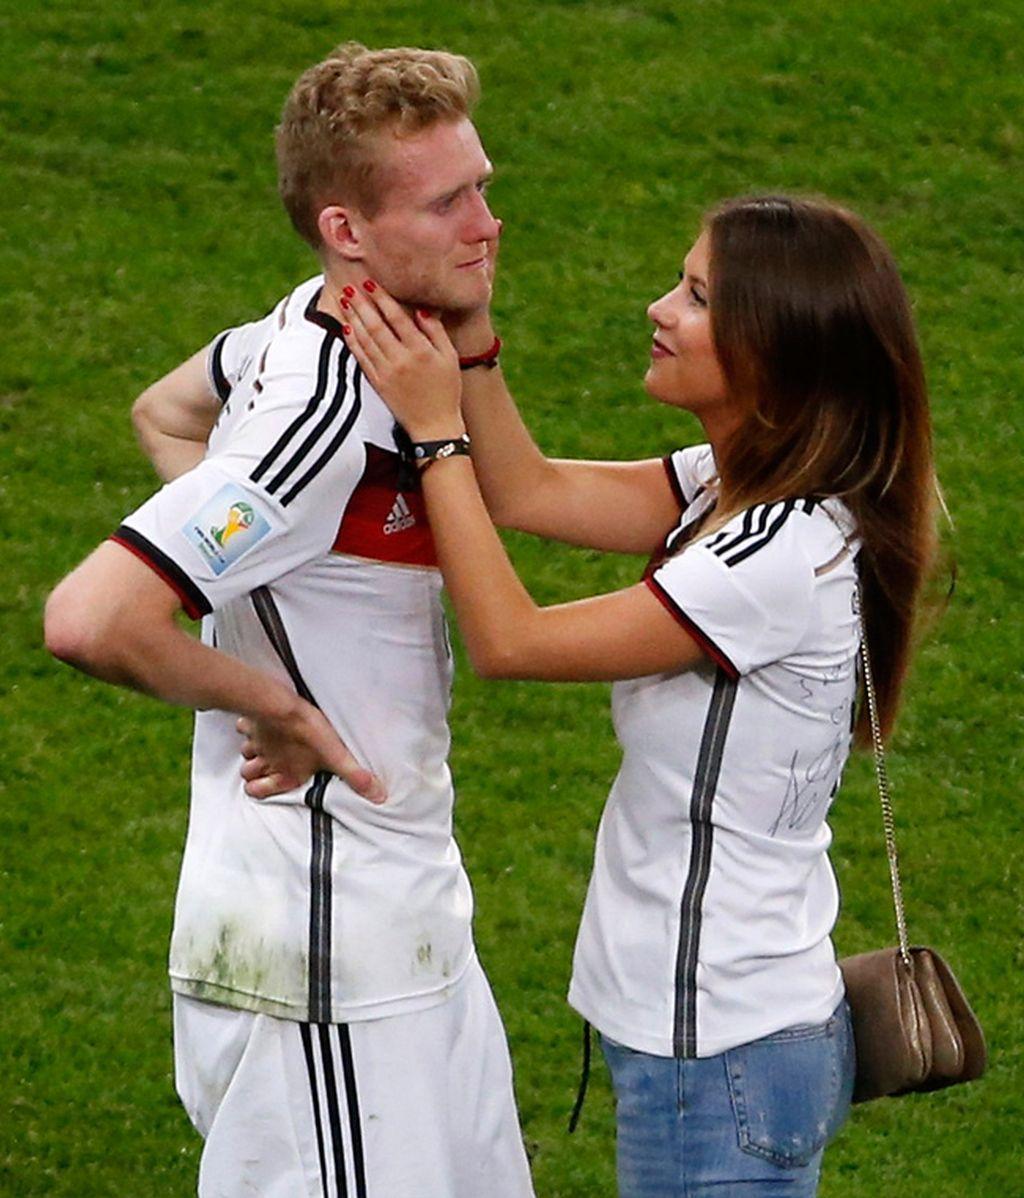 Montana Yorke, novia de Schürrle, apoyó al delantero alemán